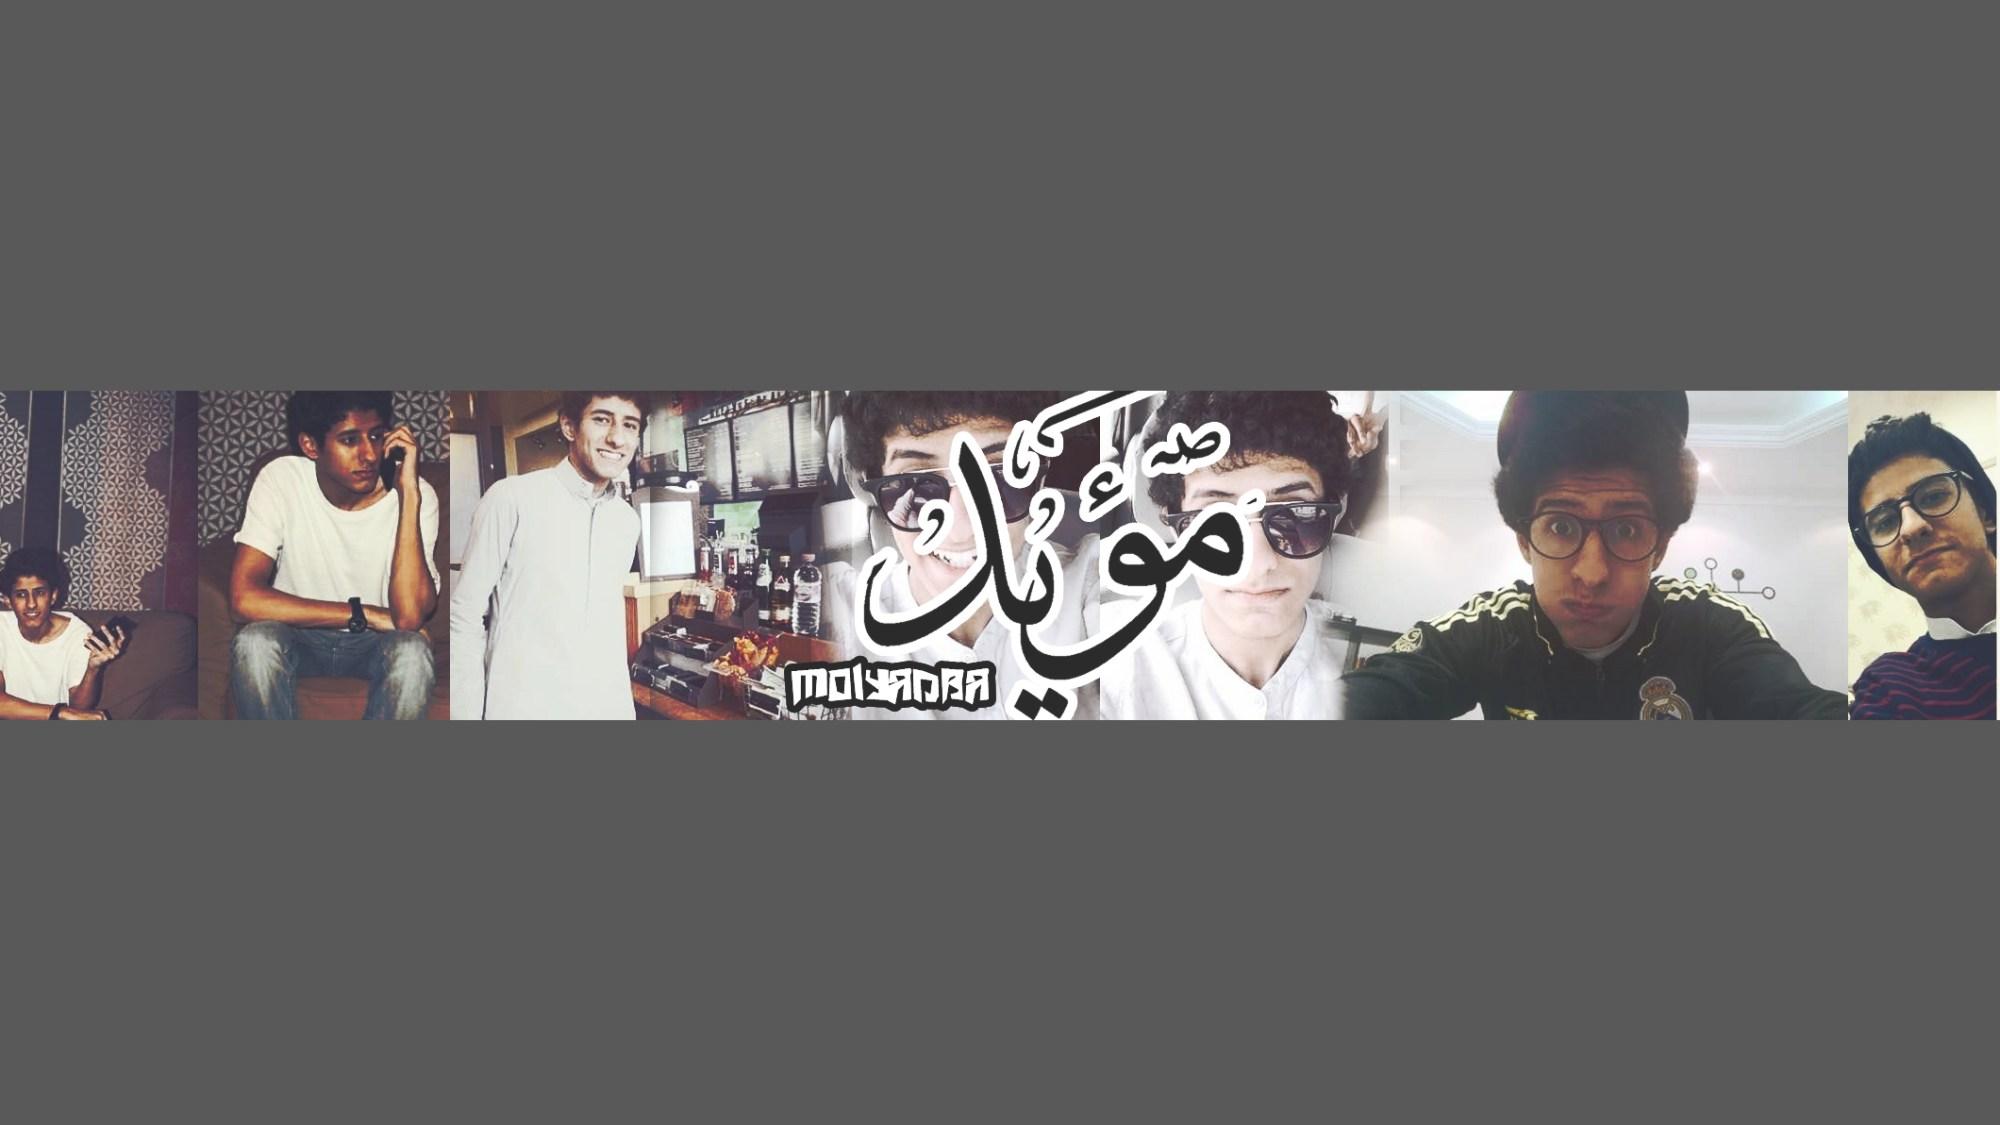 MoayadBaghdadi's Cover Photo